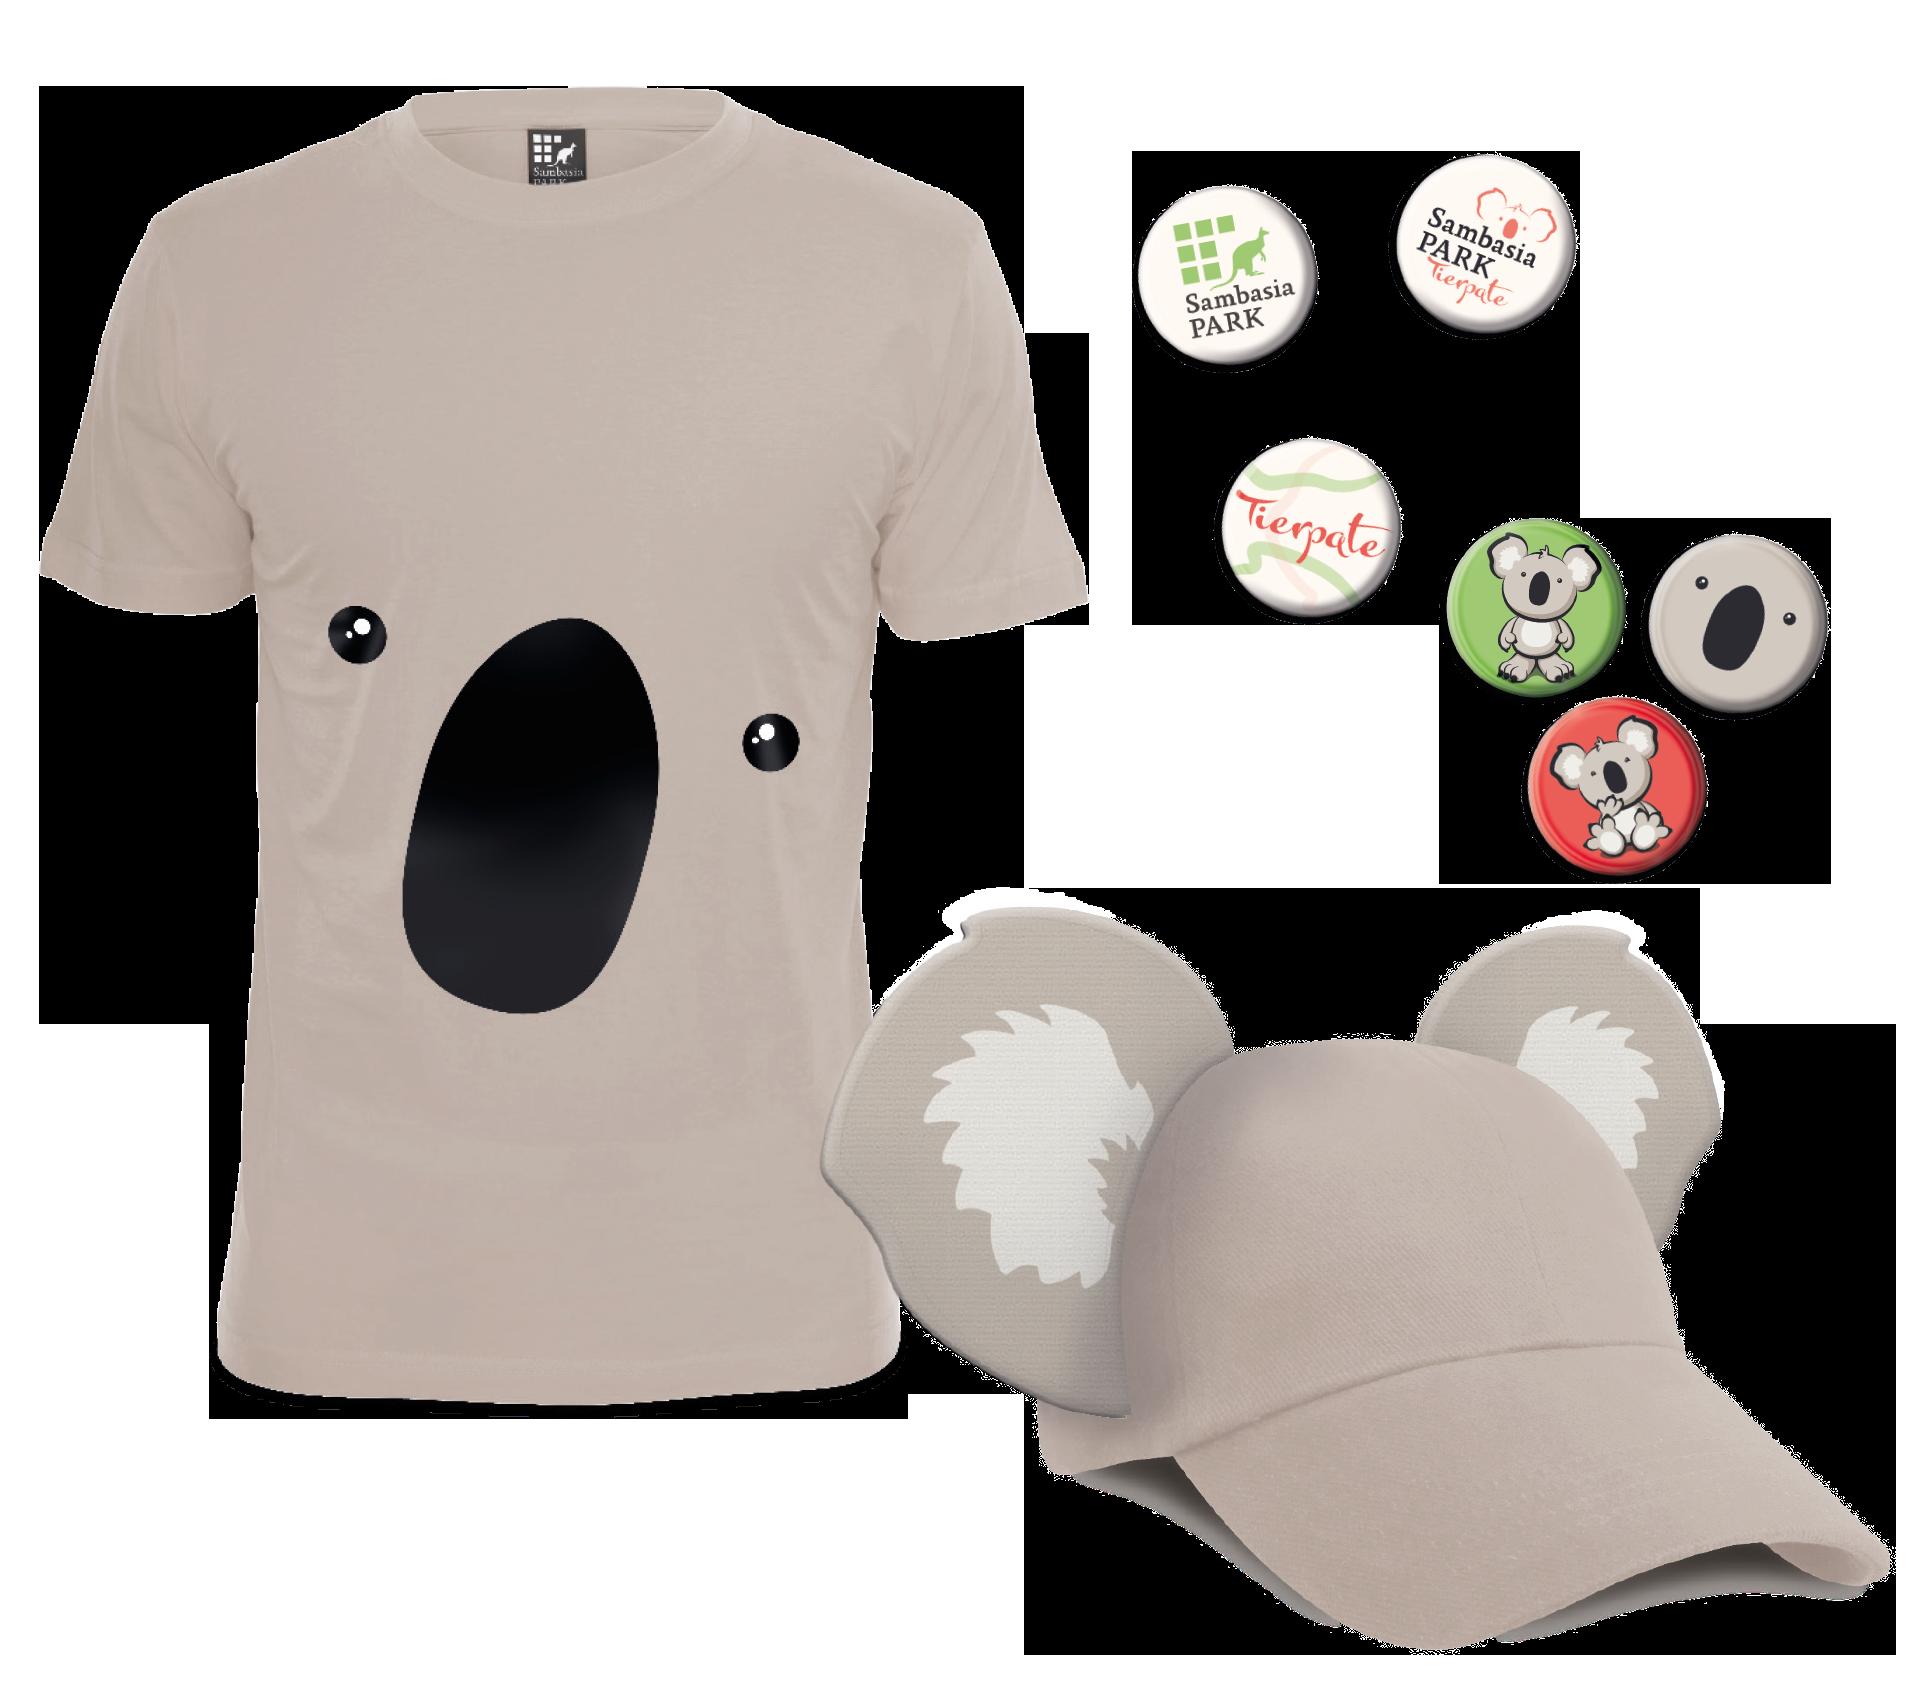 Sambasia-Park T-Shirts und Buttons